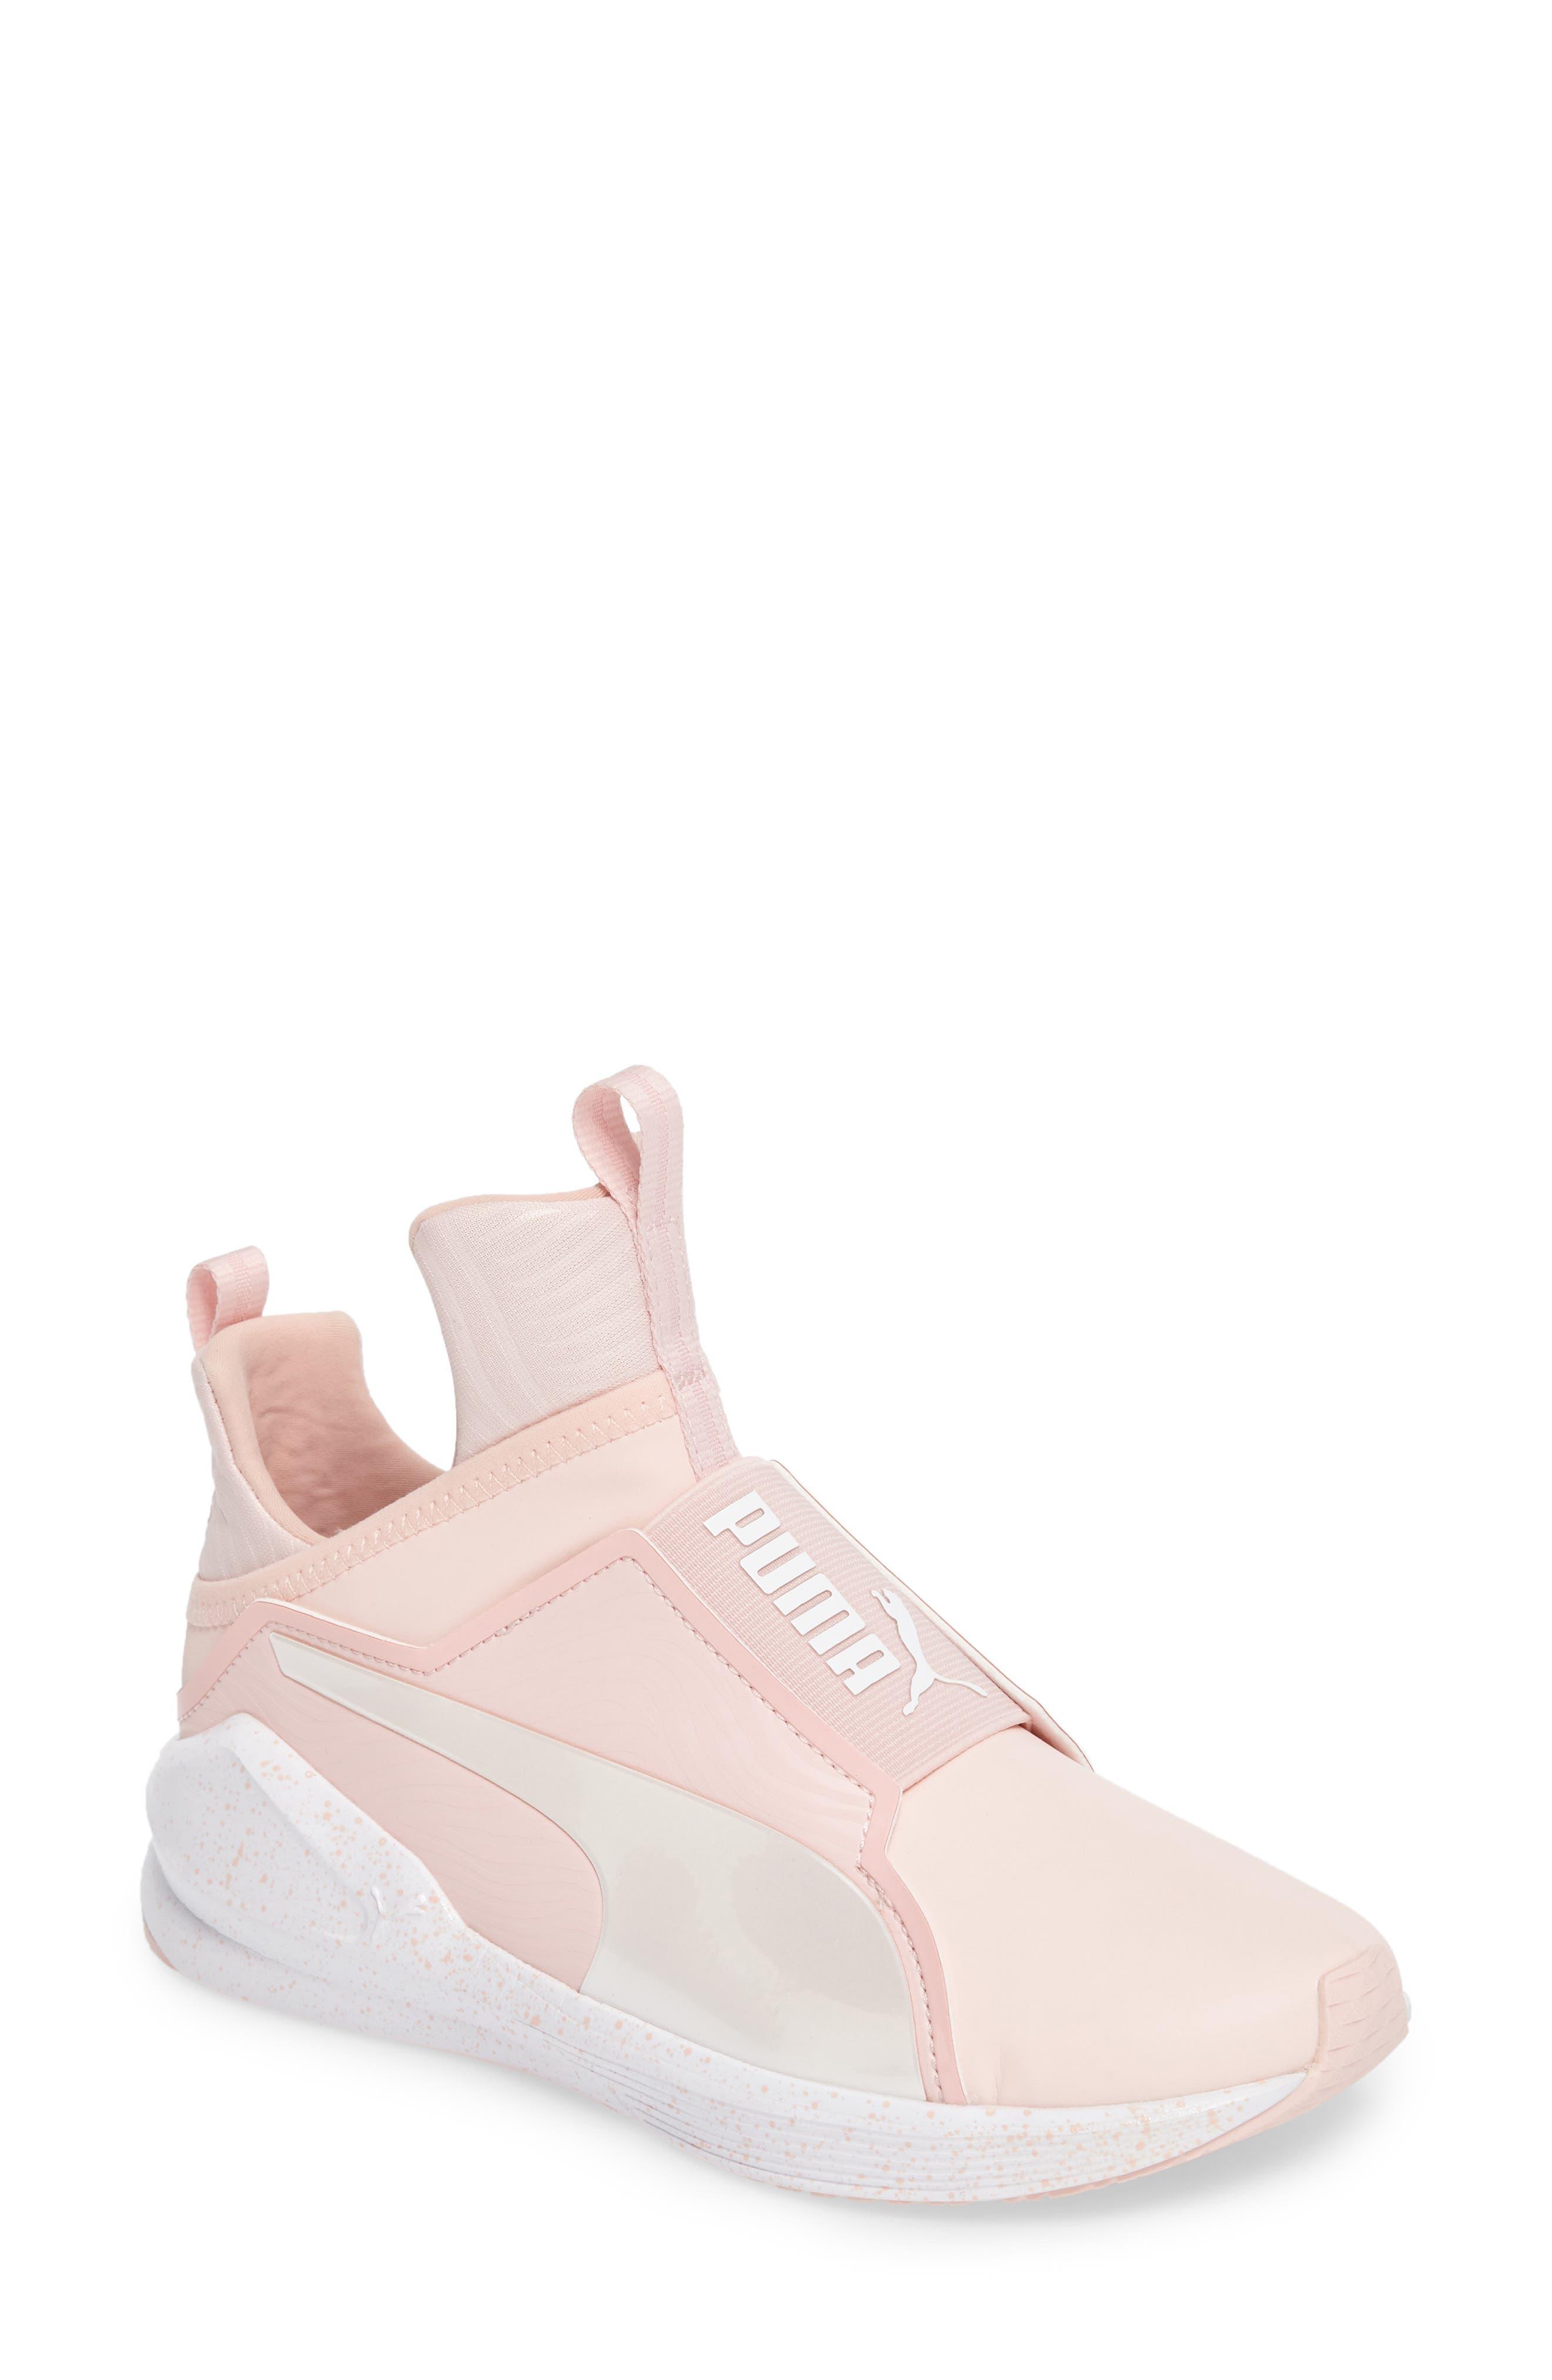 Fierce Bleached High Top Sneaker,                             Main thumbnail 1, color,                             Veiled Rose/ Whisper White